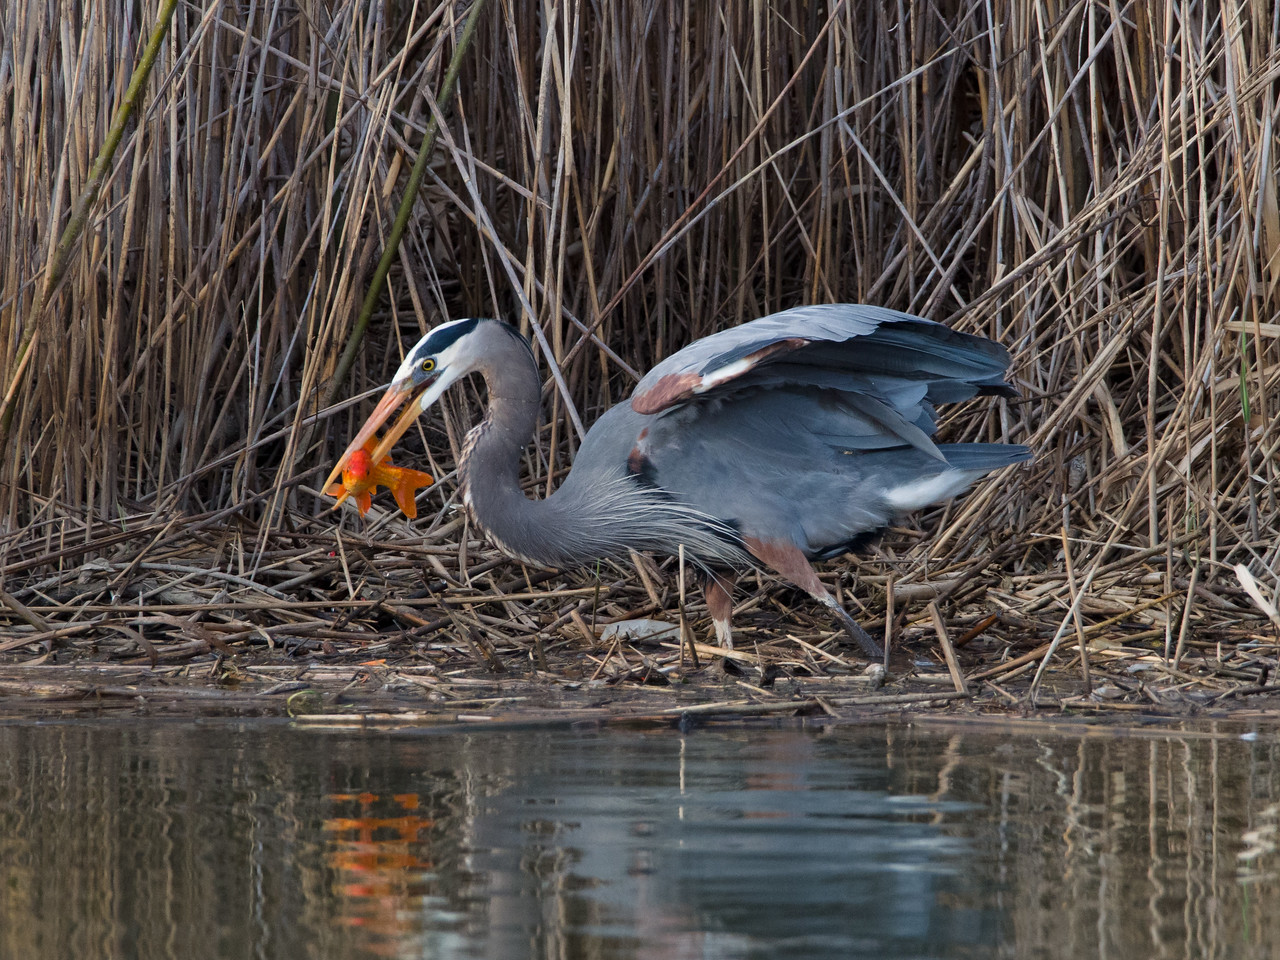 Hungry, hungry heron!